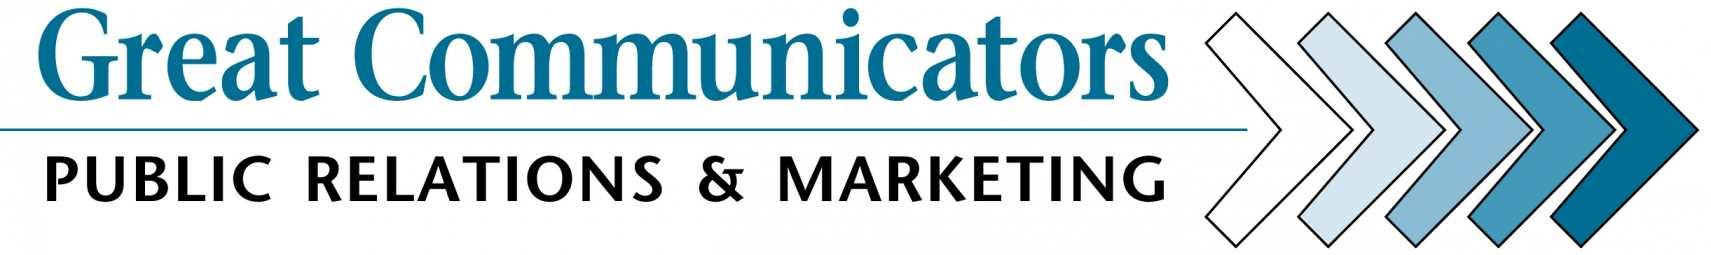 Great Communicators Public Relations & Marketing Logo